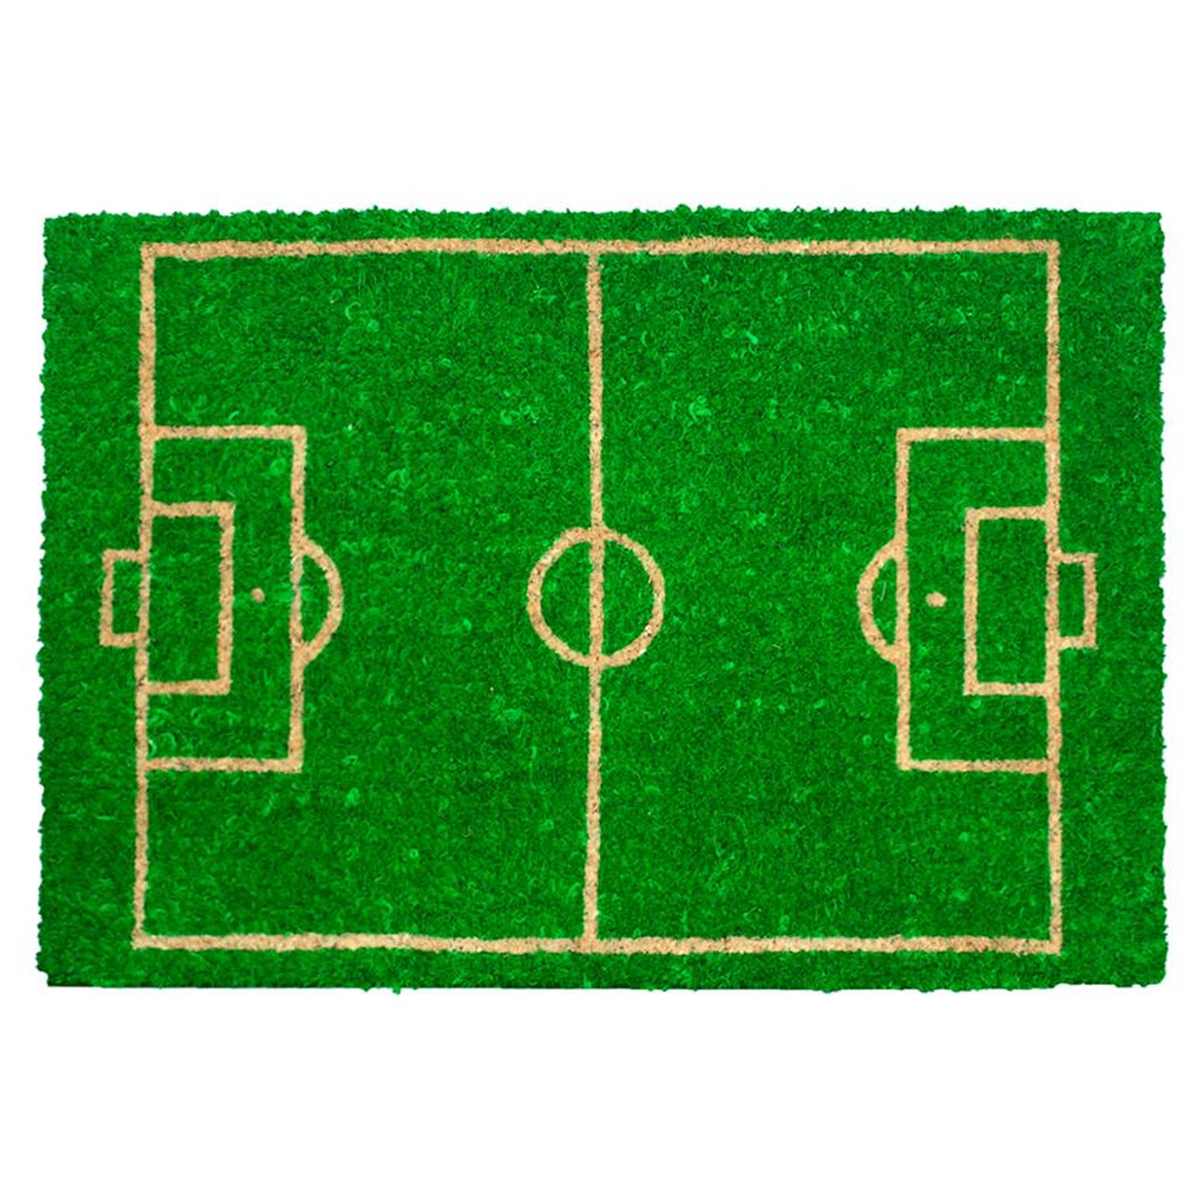 Paillasson \'Football\' vert - [L4057]